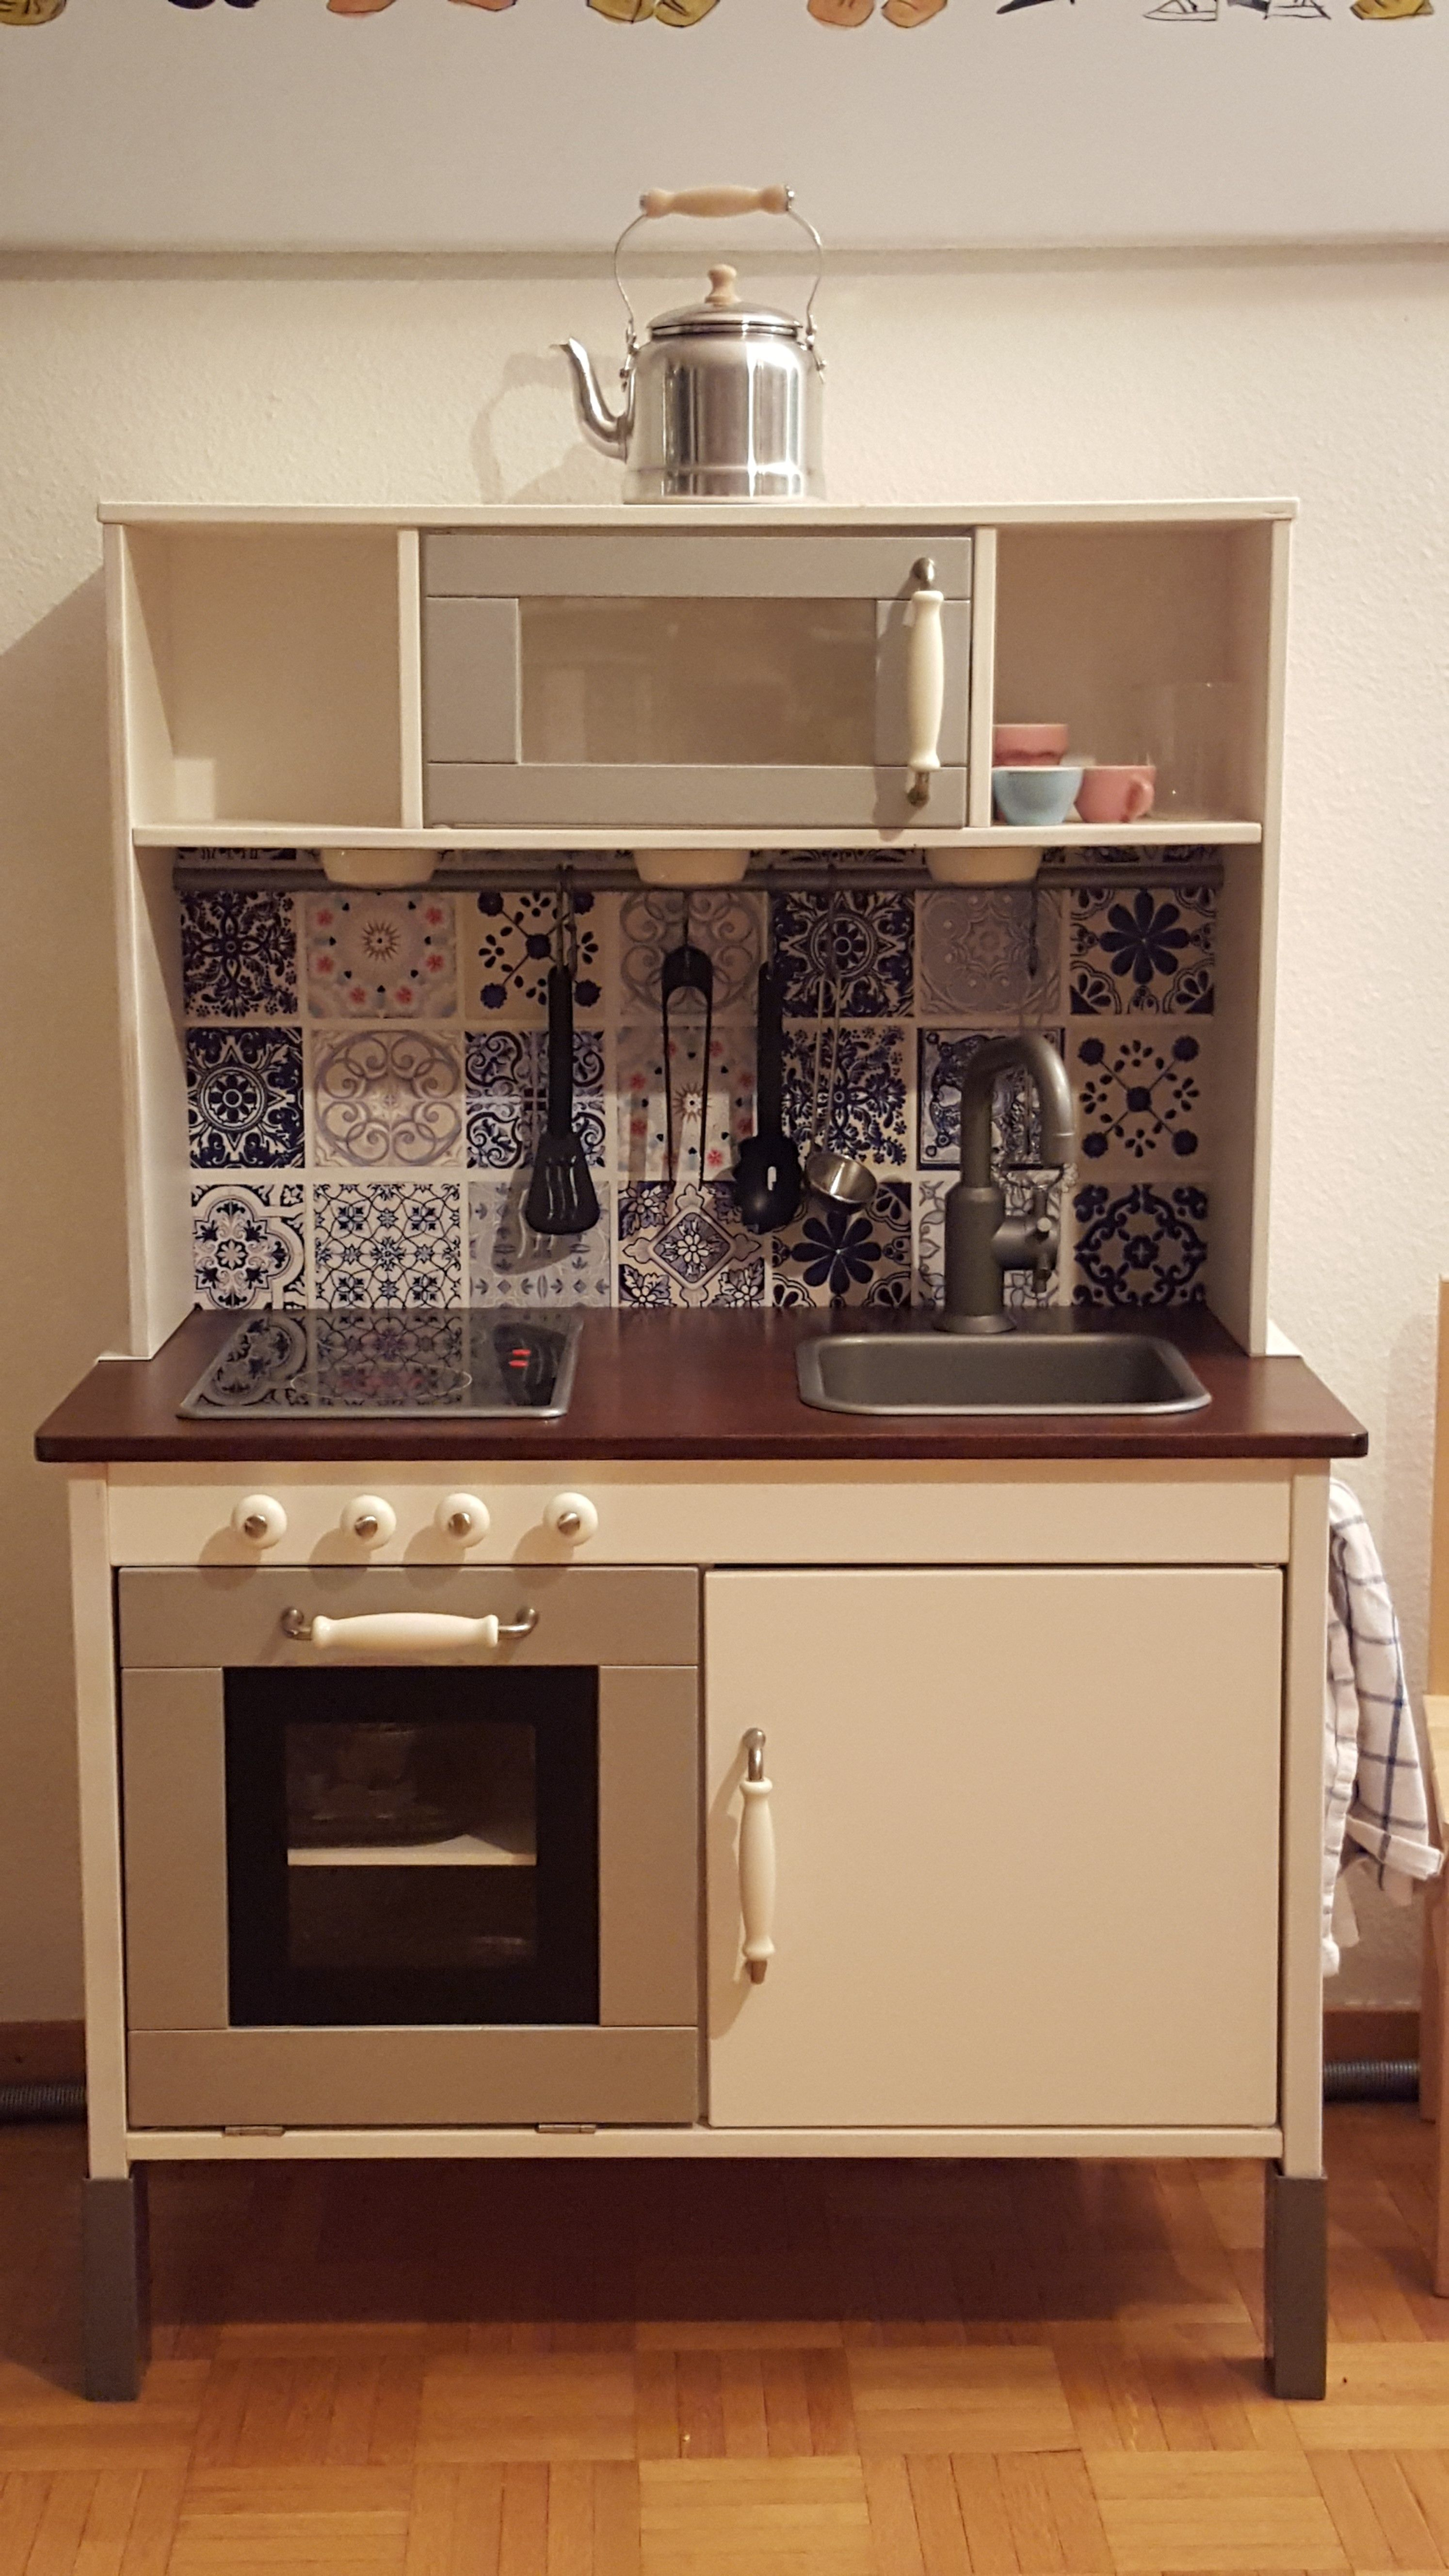 Ikea Duktig Children Kitchen Makeover   Another Makeover For Inspiration.  Love The U0027tilesu0027